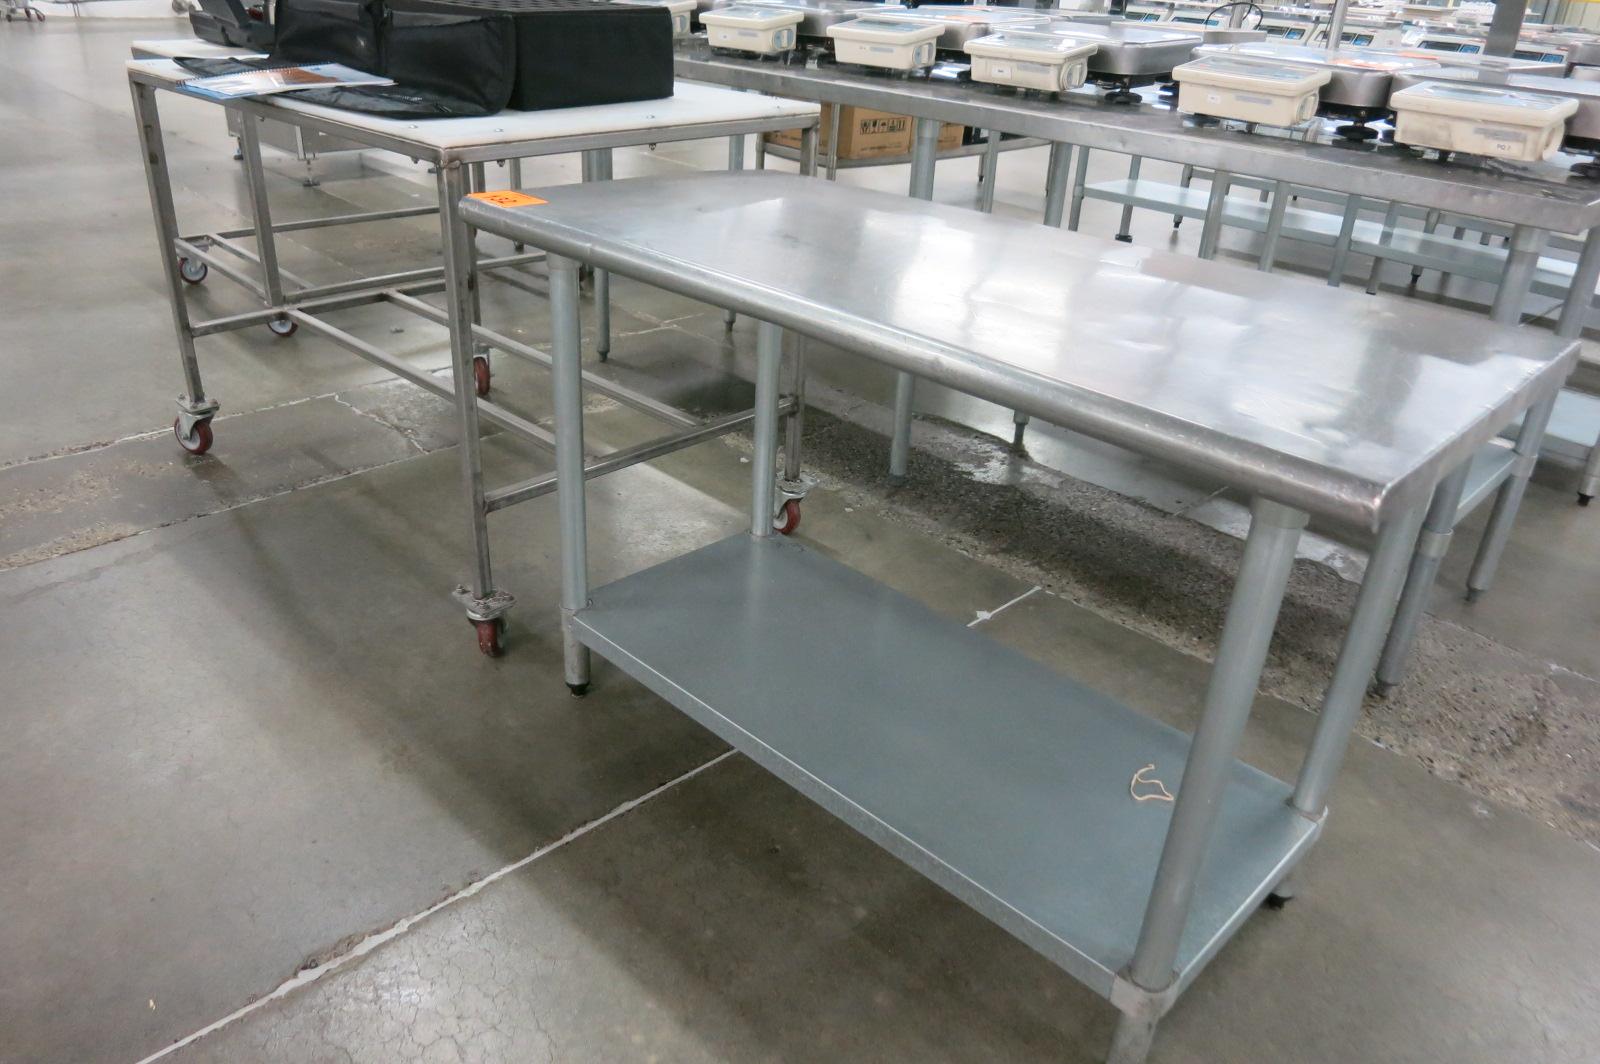 Lot 132 - Tables